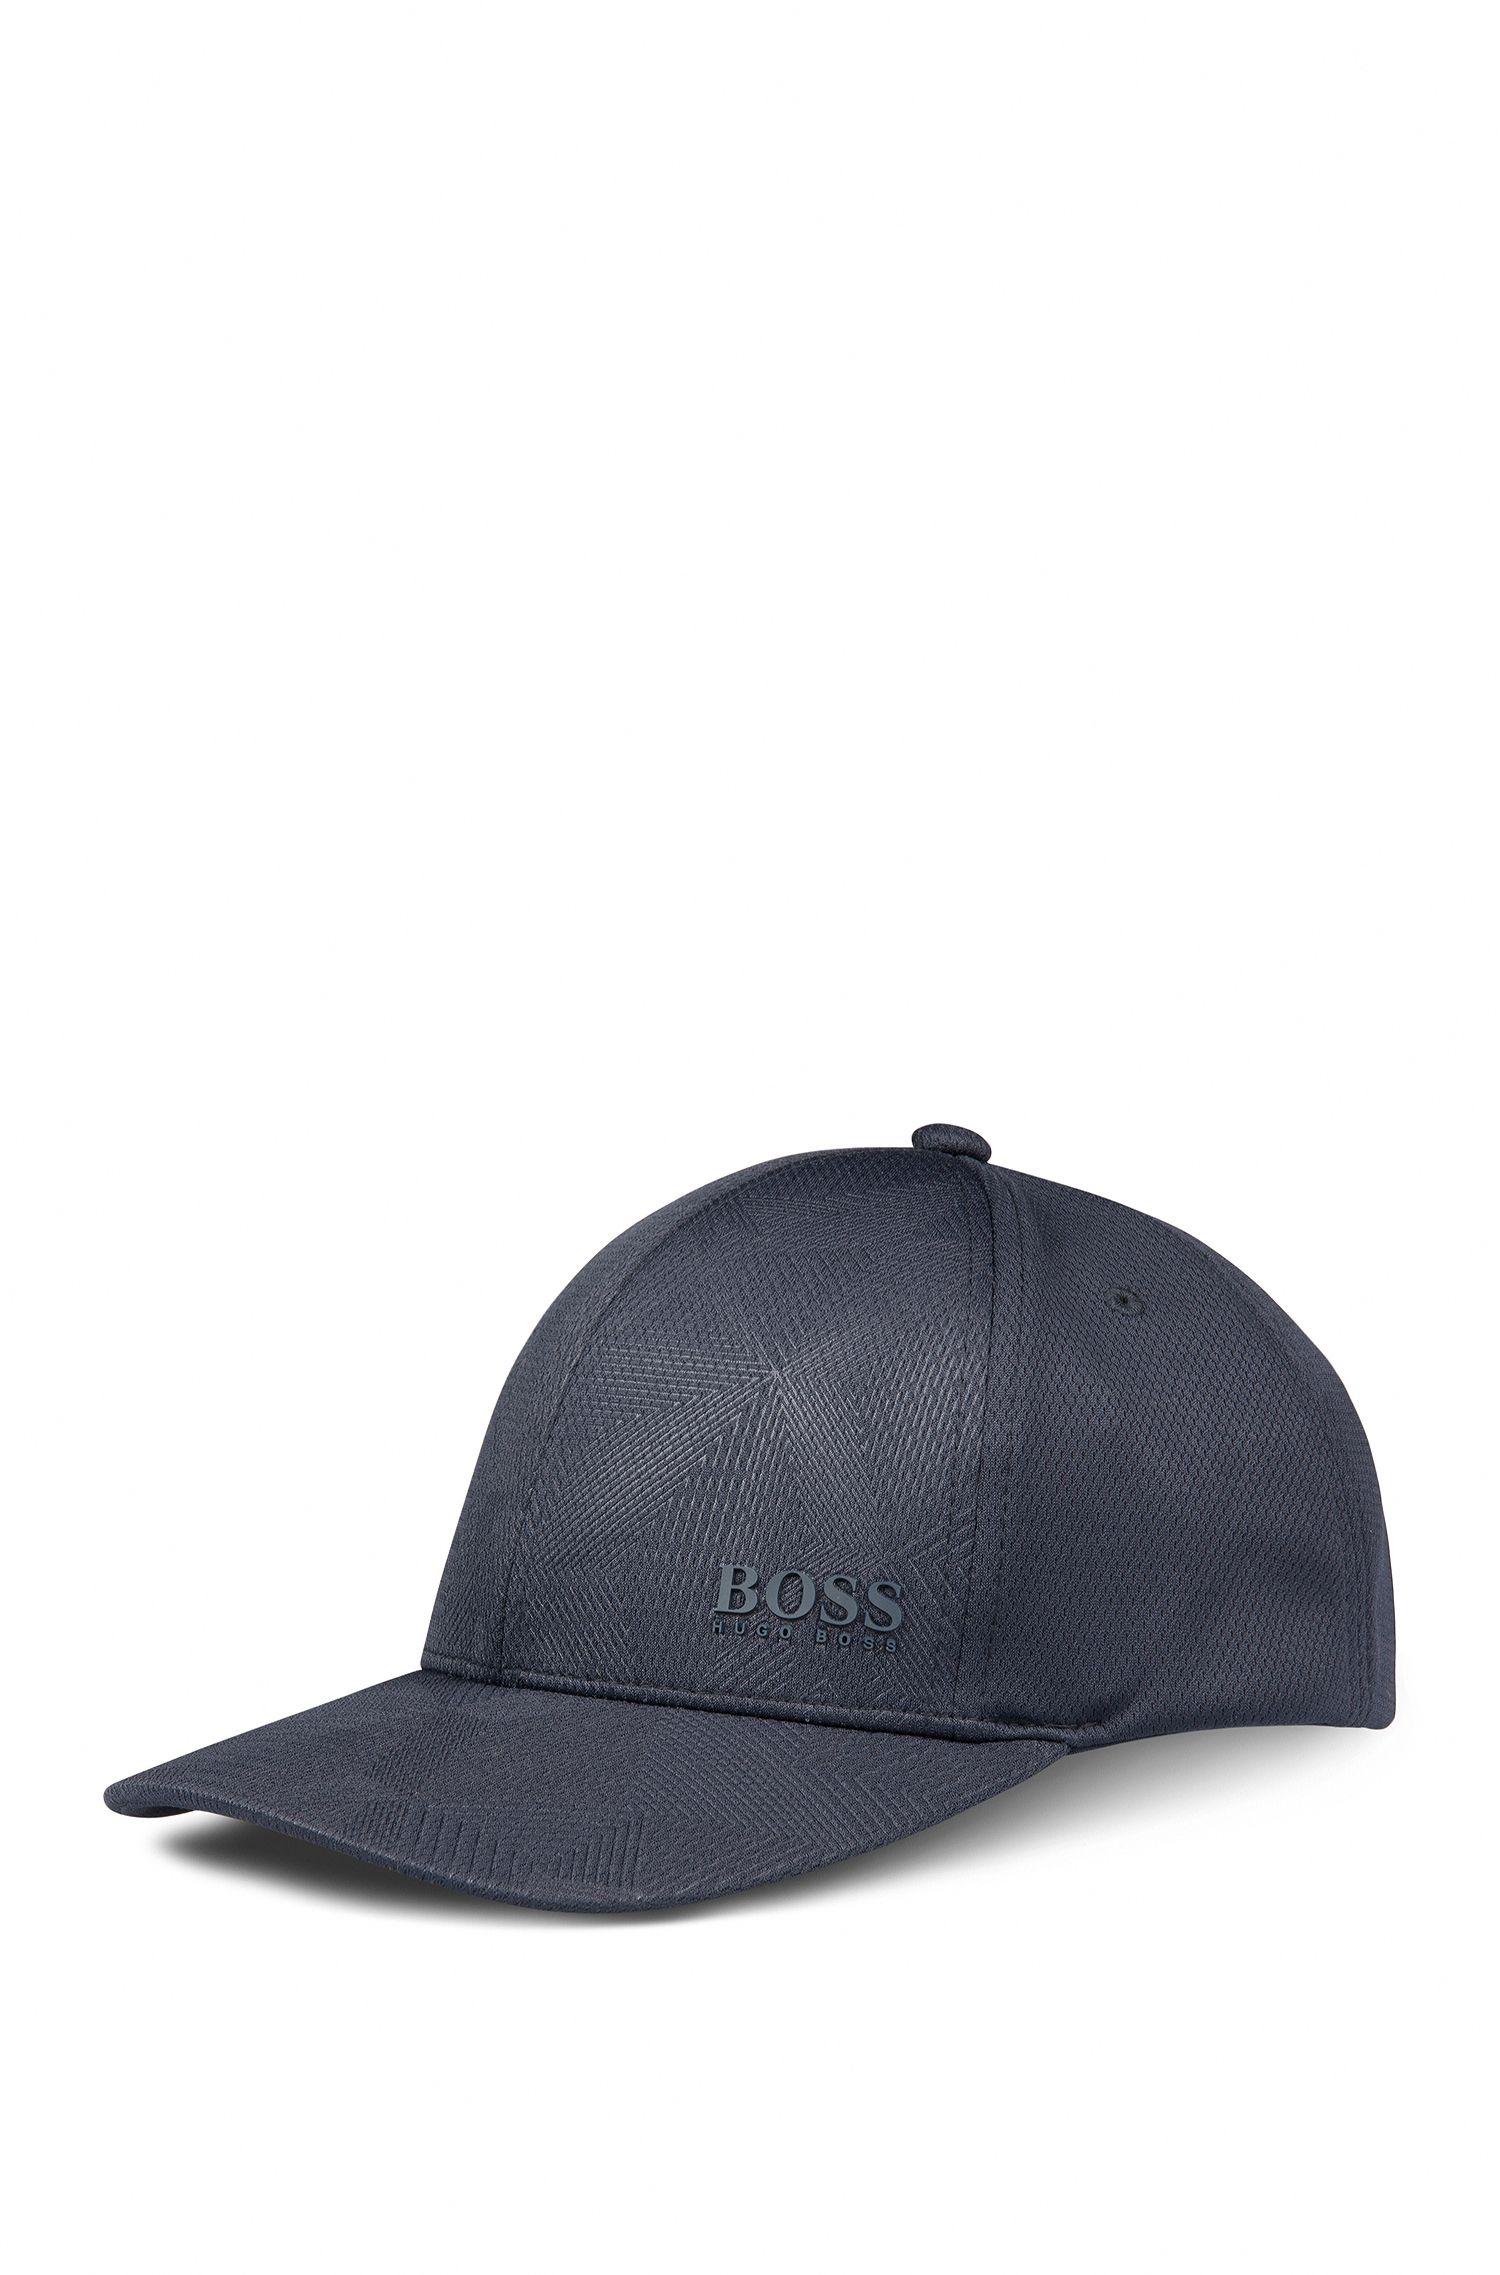 Baseball Cap aus Material-Mix mit Wabenstruktur